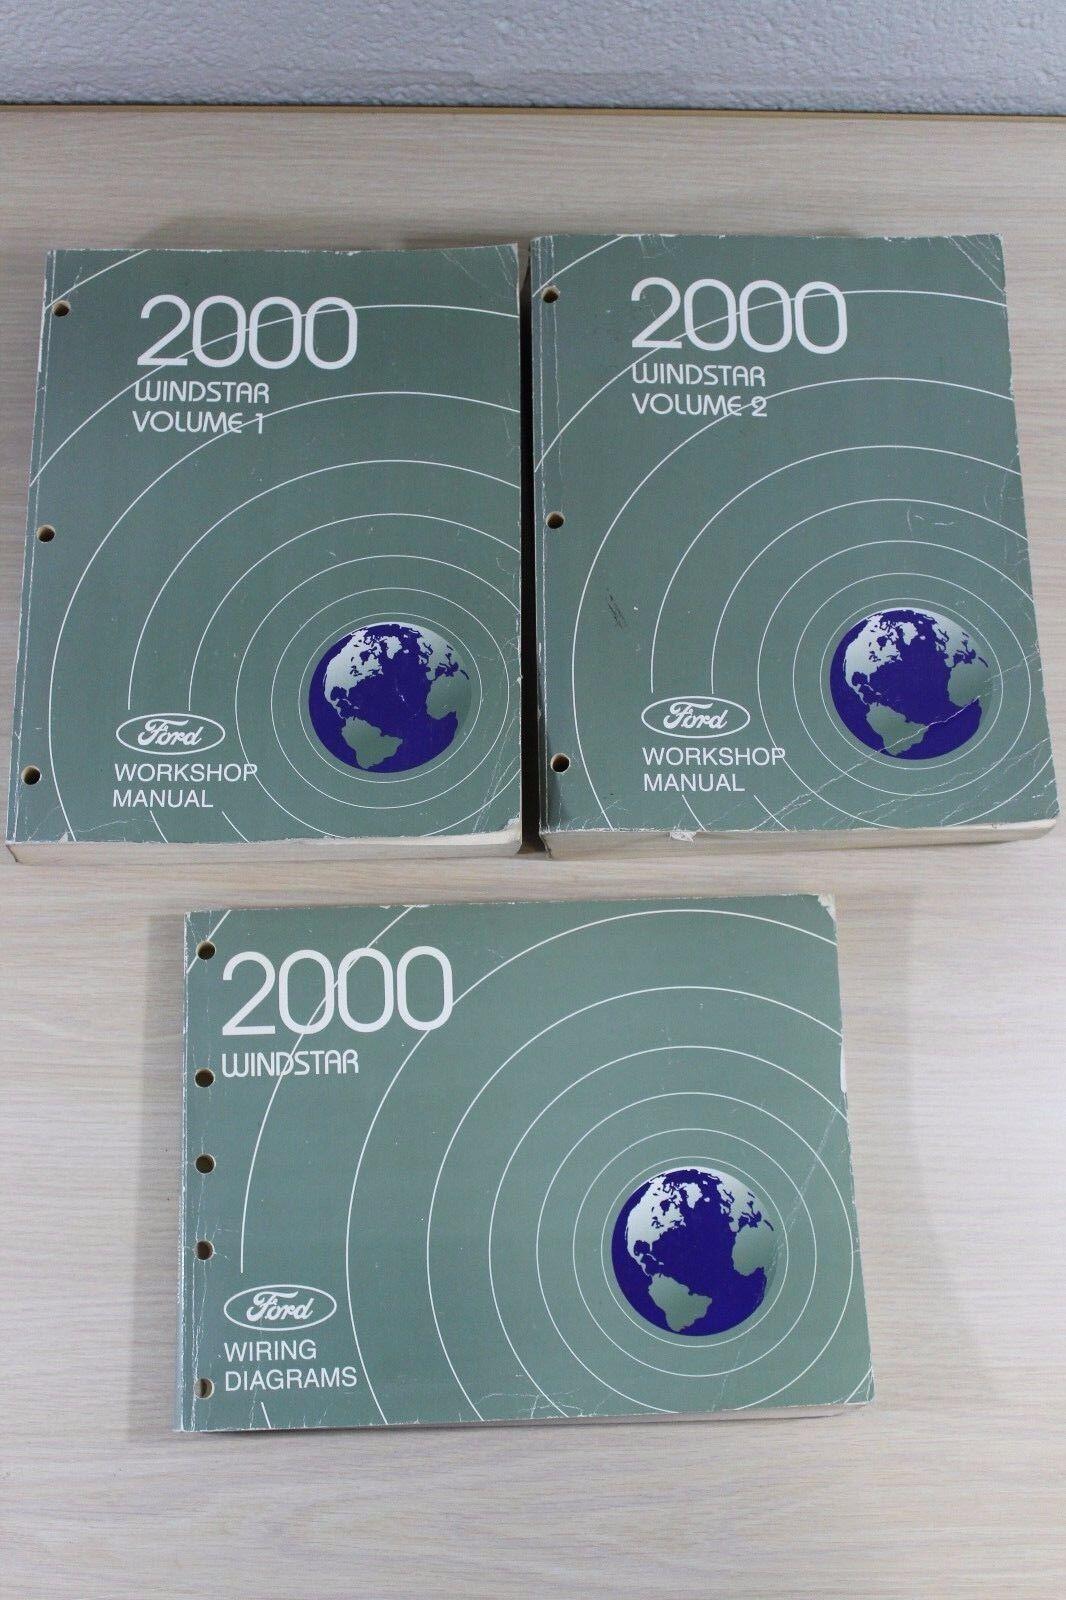 Used 2000 Ford Windstar Workshop Manual 1  U0026 2  U0026 Wiring Diagrams Book Set For Sale